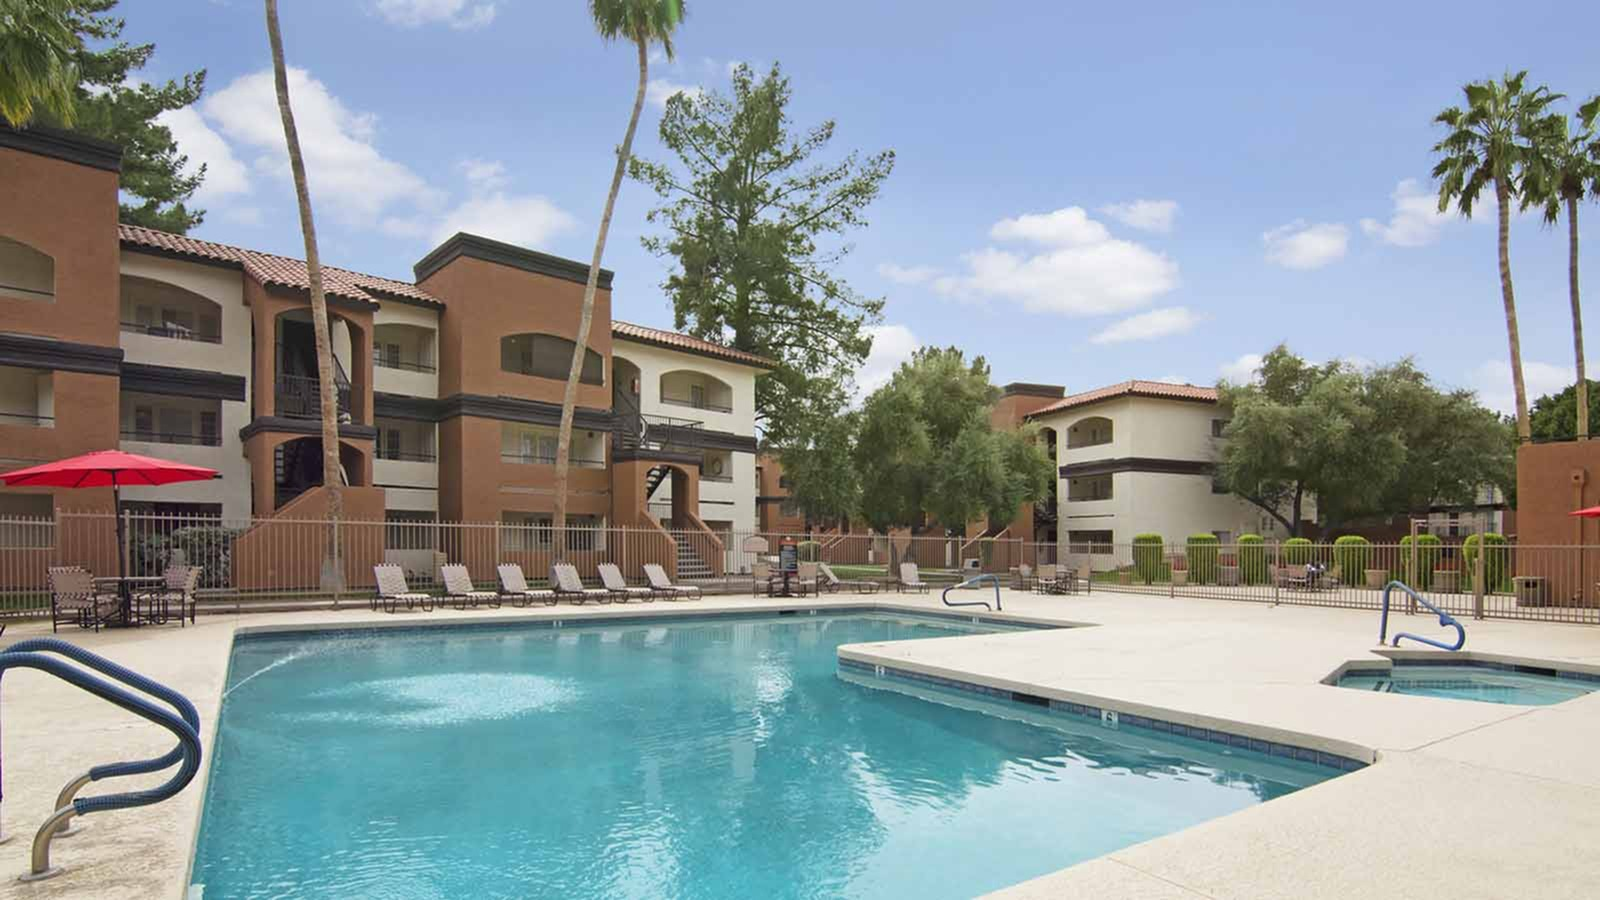 Country Club Verandas Apartments - uCribs